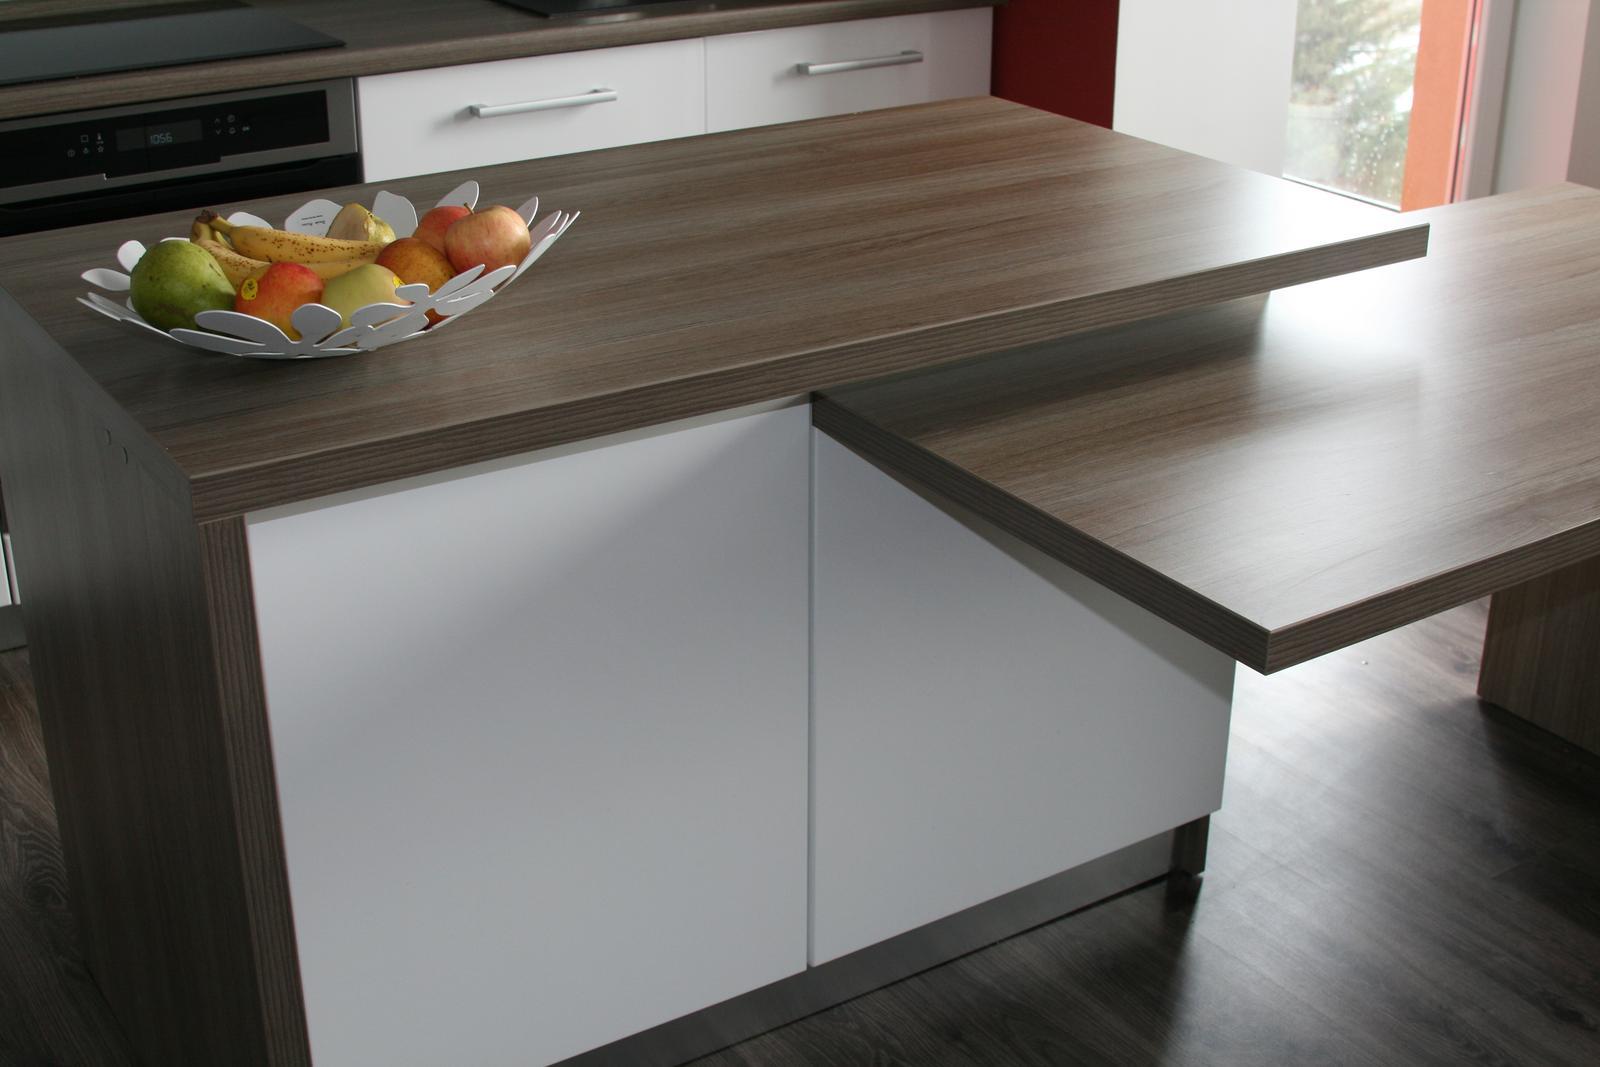 Nasa kuchyna - ostrovcek spojeny so stolom..